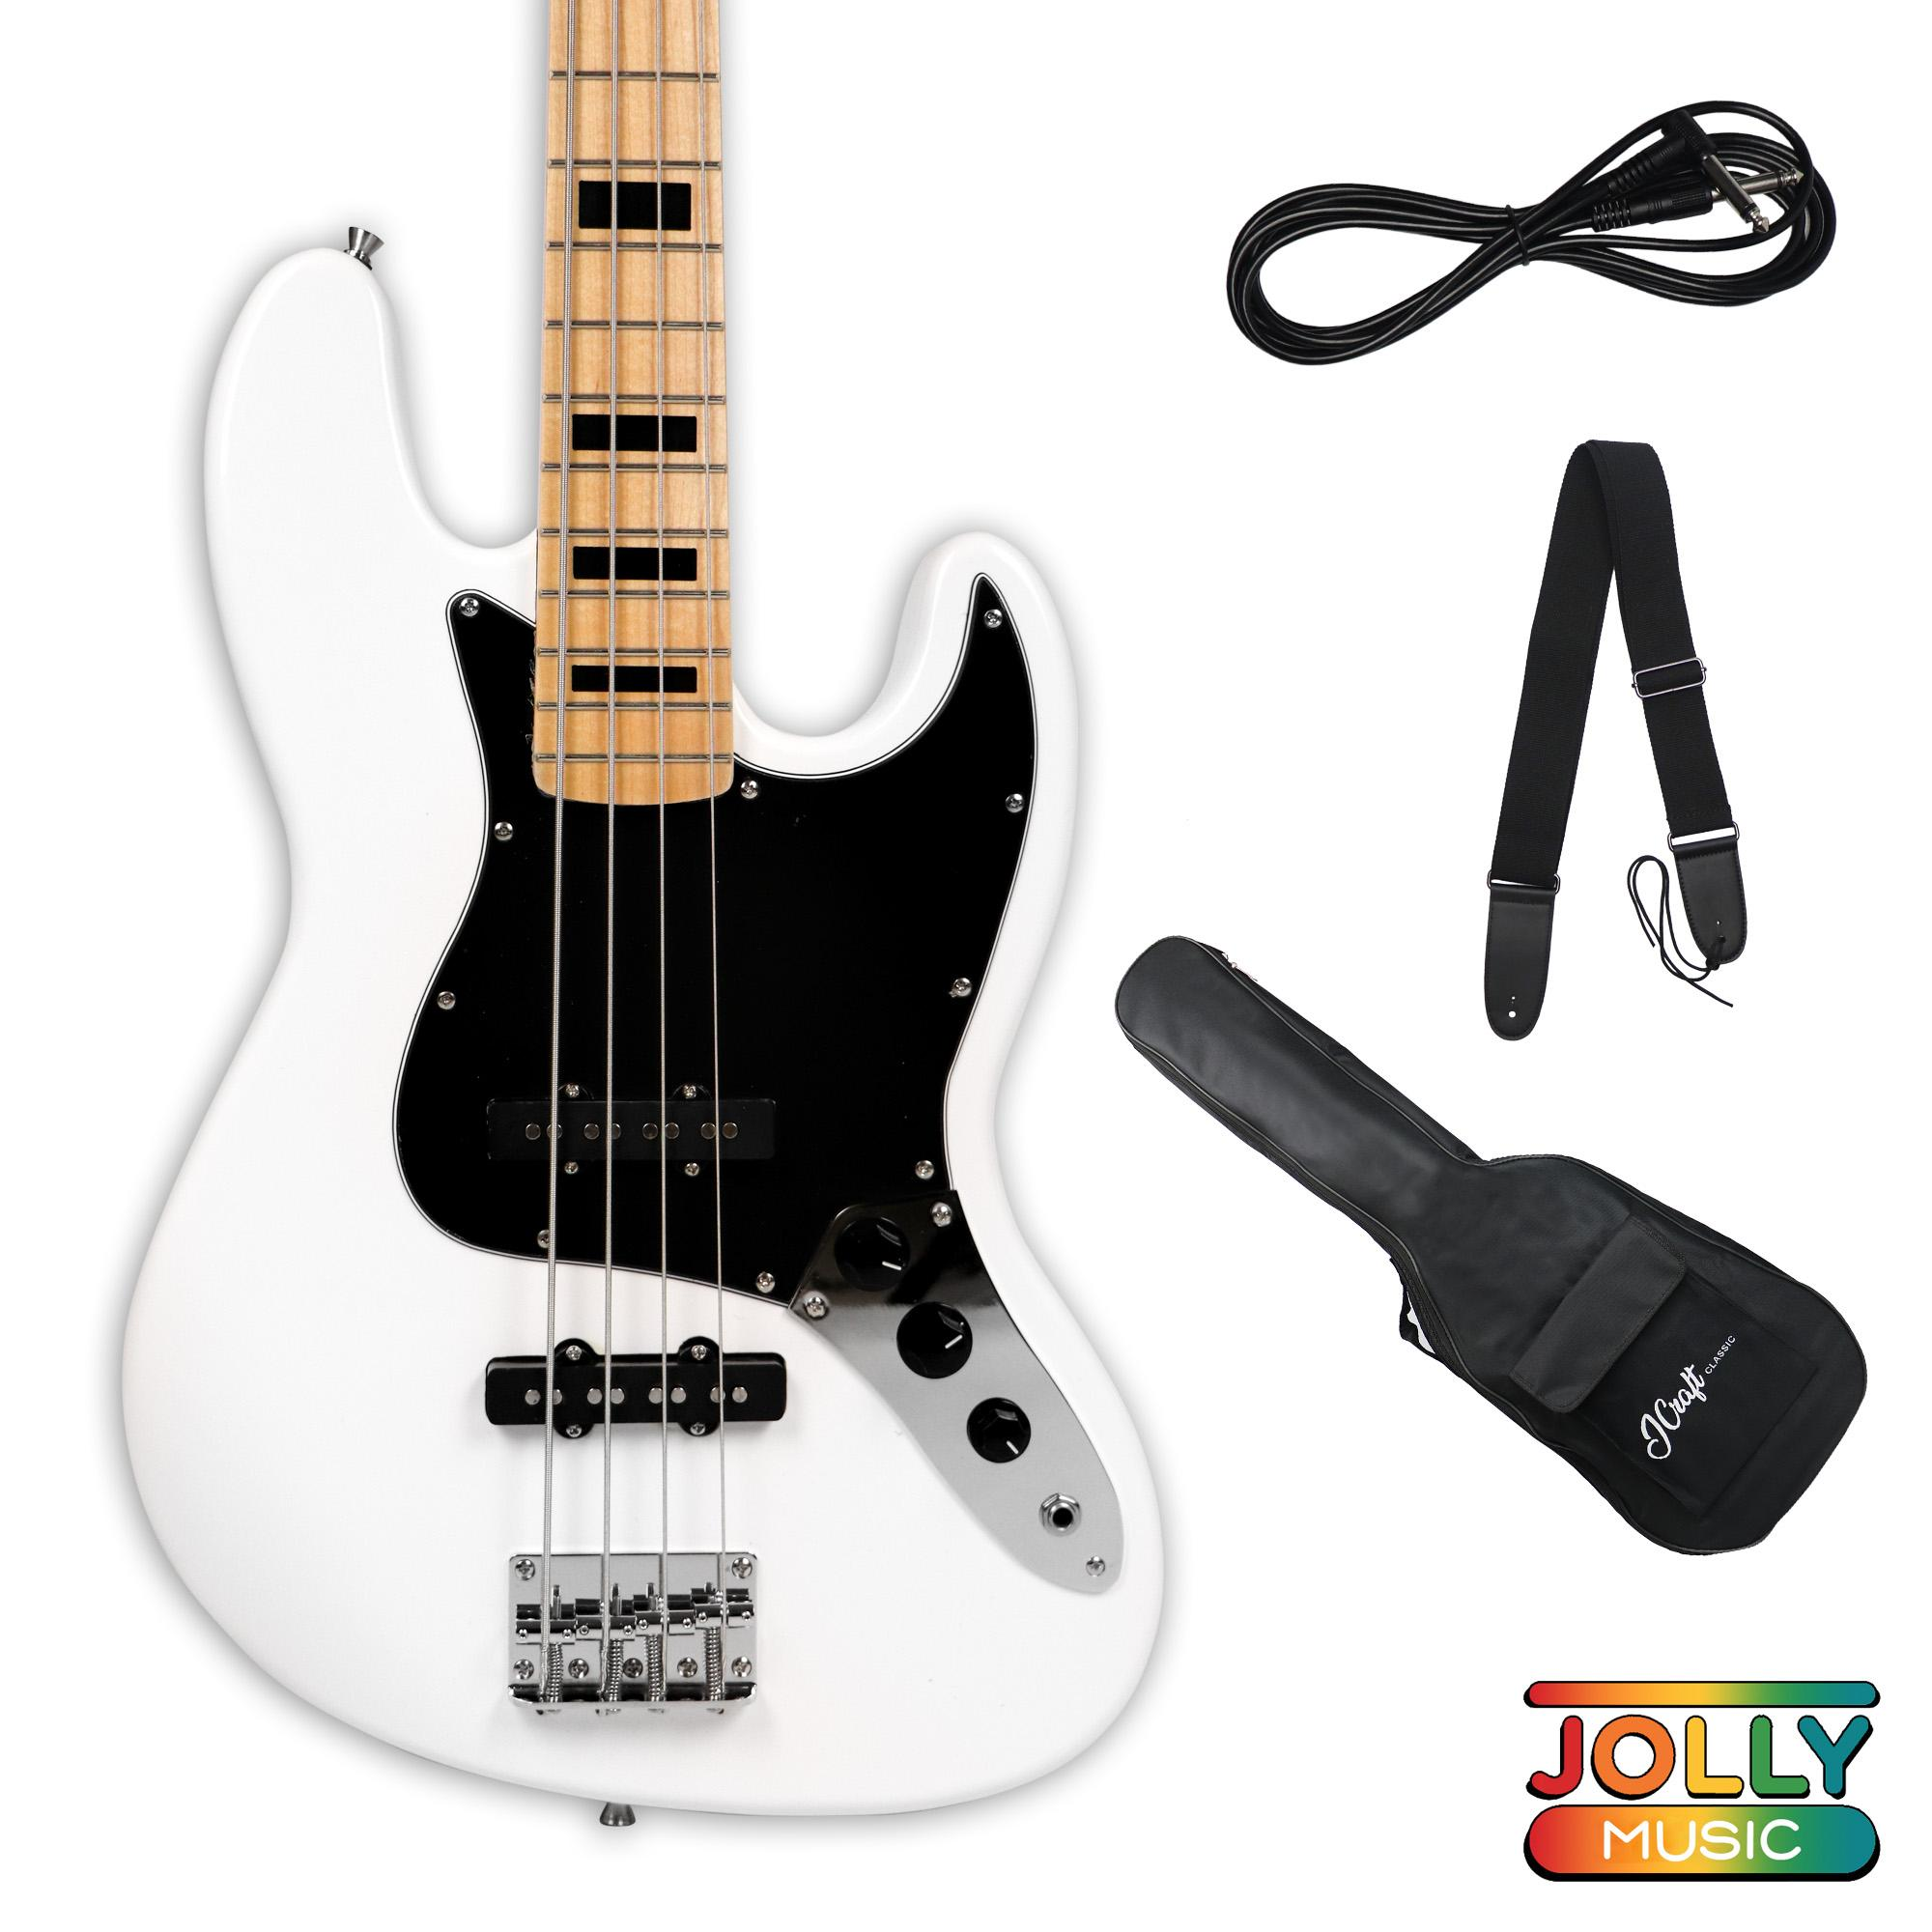 Bass Guitars For Sale Guitar Best Seller Prices Brands In Electric Violin Preamplifier J Craft Jb 1 4 String Jazz